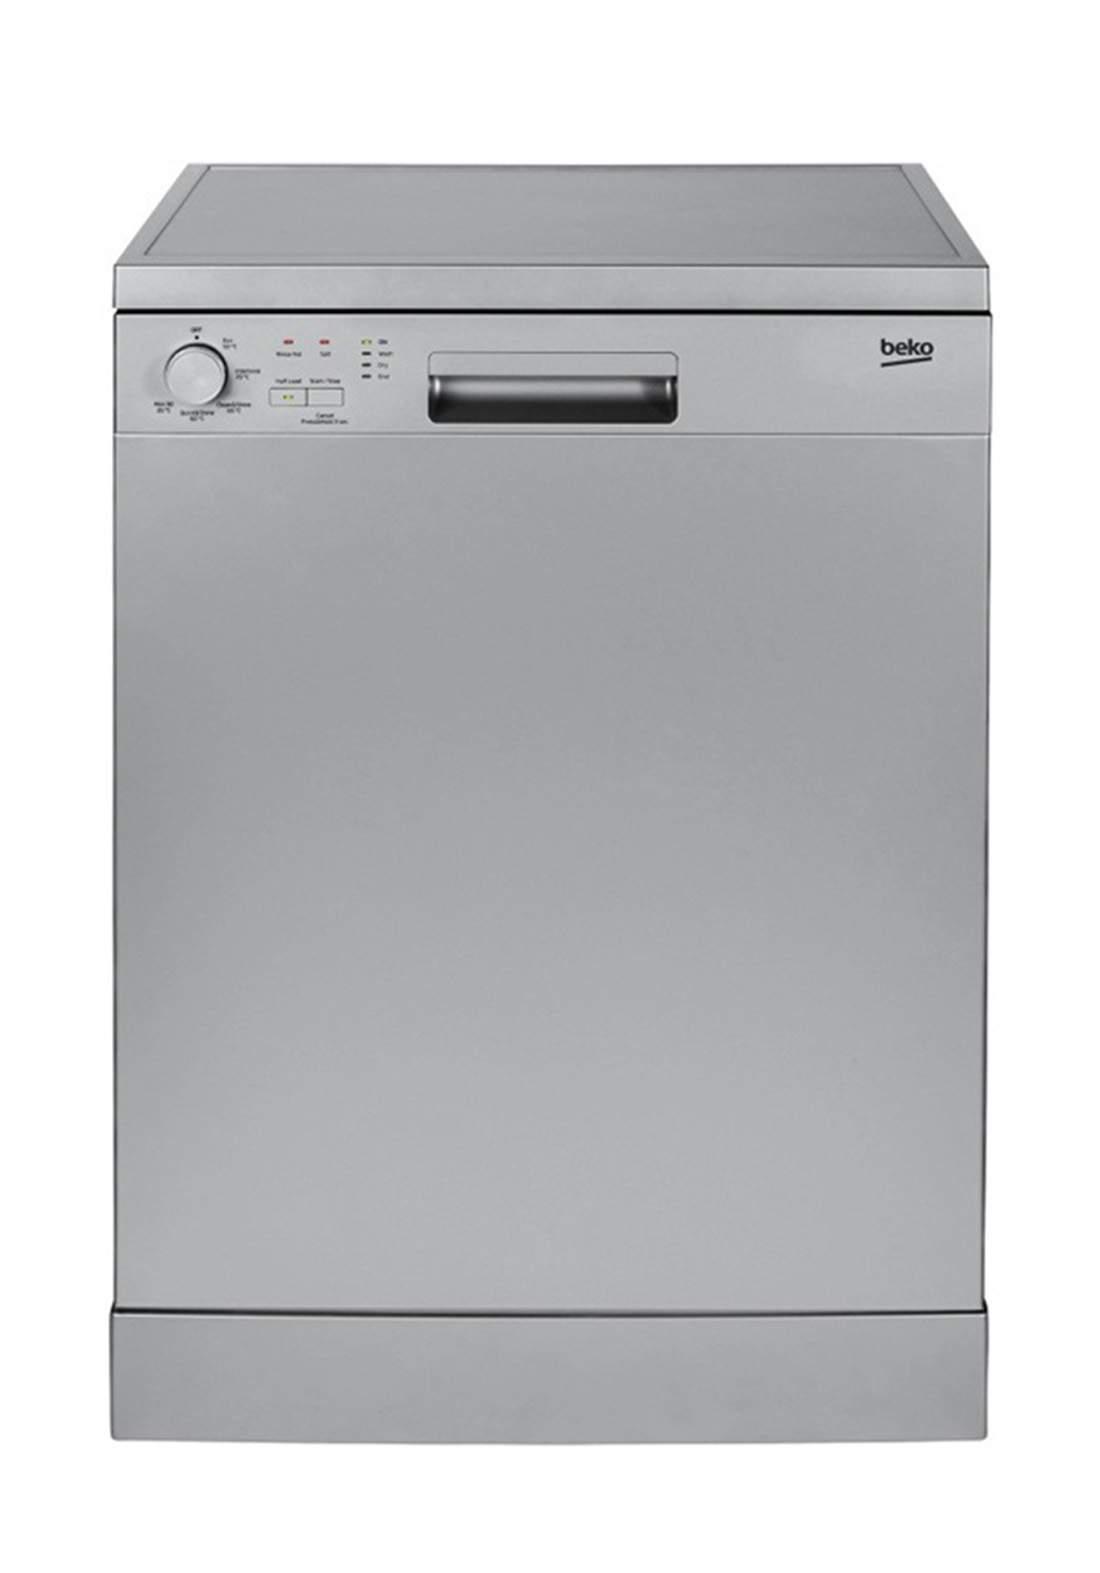 Beko DFN 05210 S Dishwasher 5 Programs Capacity Of 12 Sets - Silver غسالة صحون